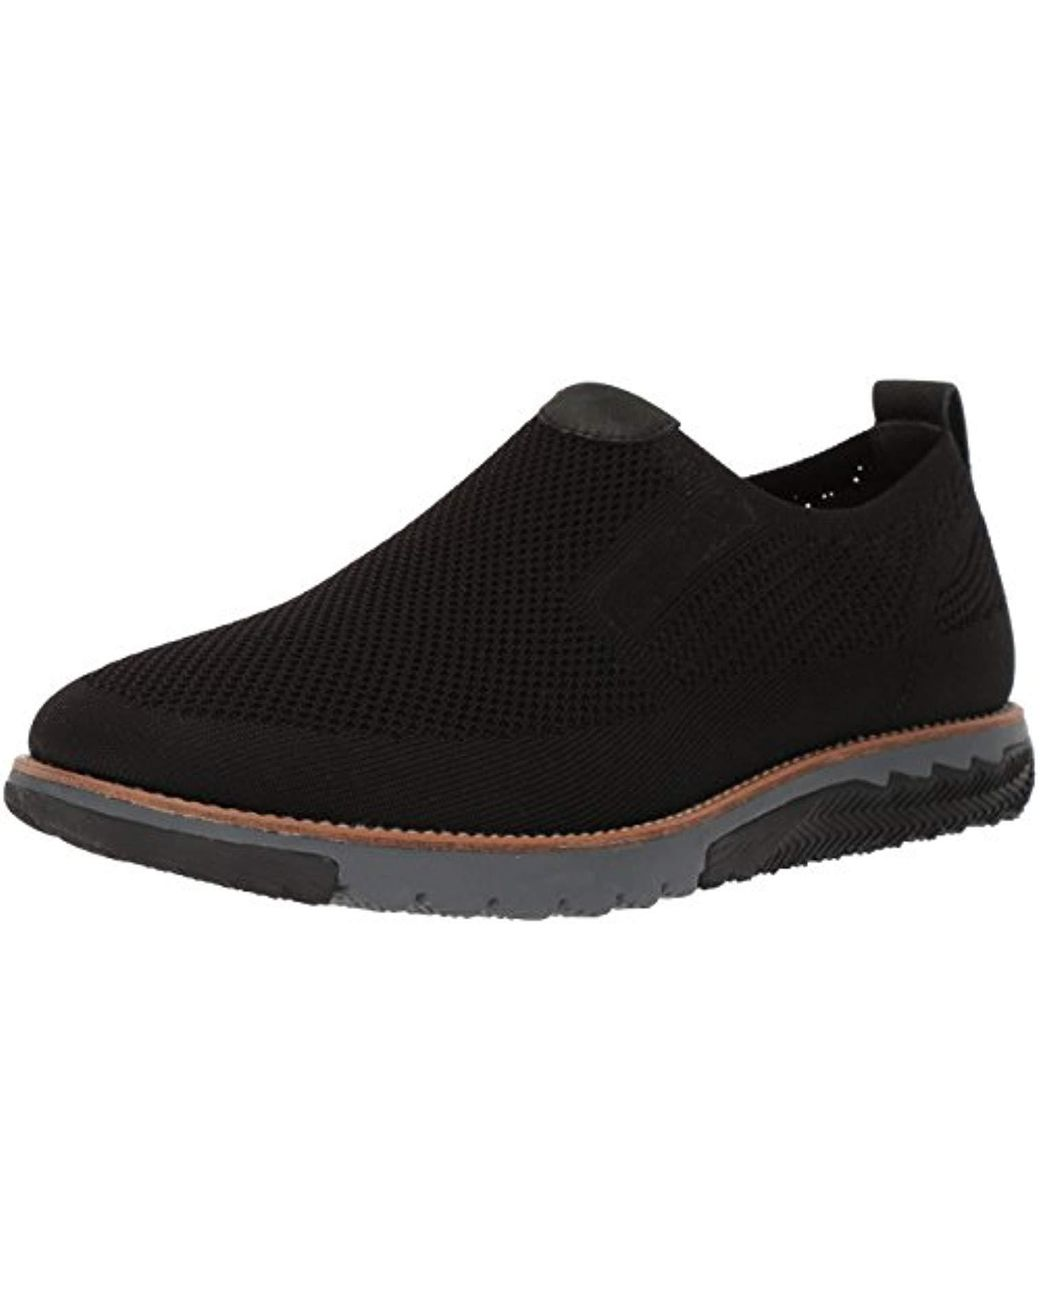 d844d077148 Lyst - Hush Puppies Expert Mt Slipon Loafer in Black for Men - Save 29%